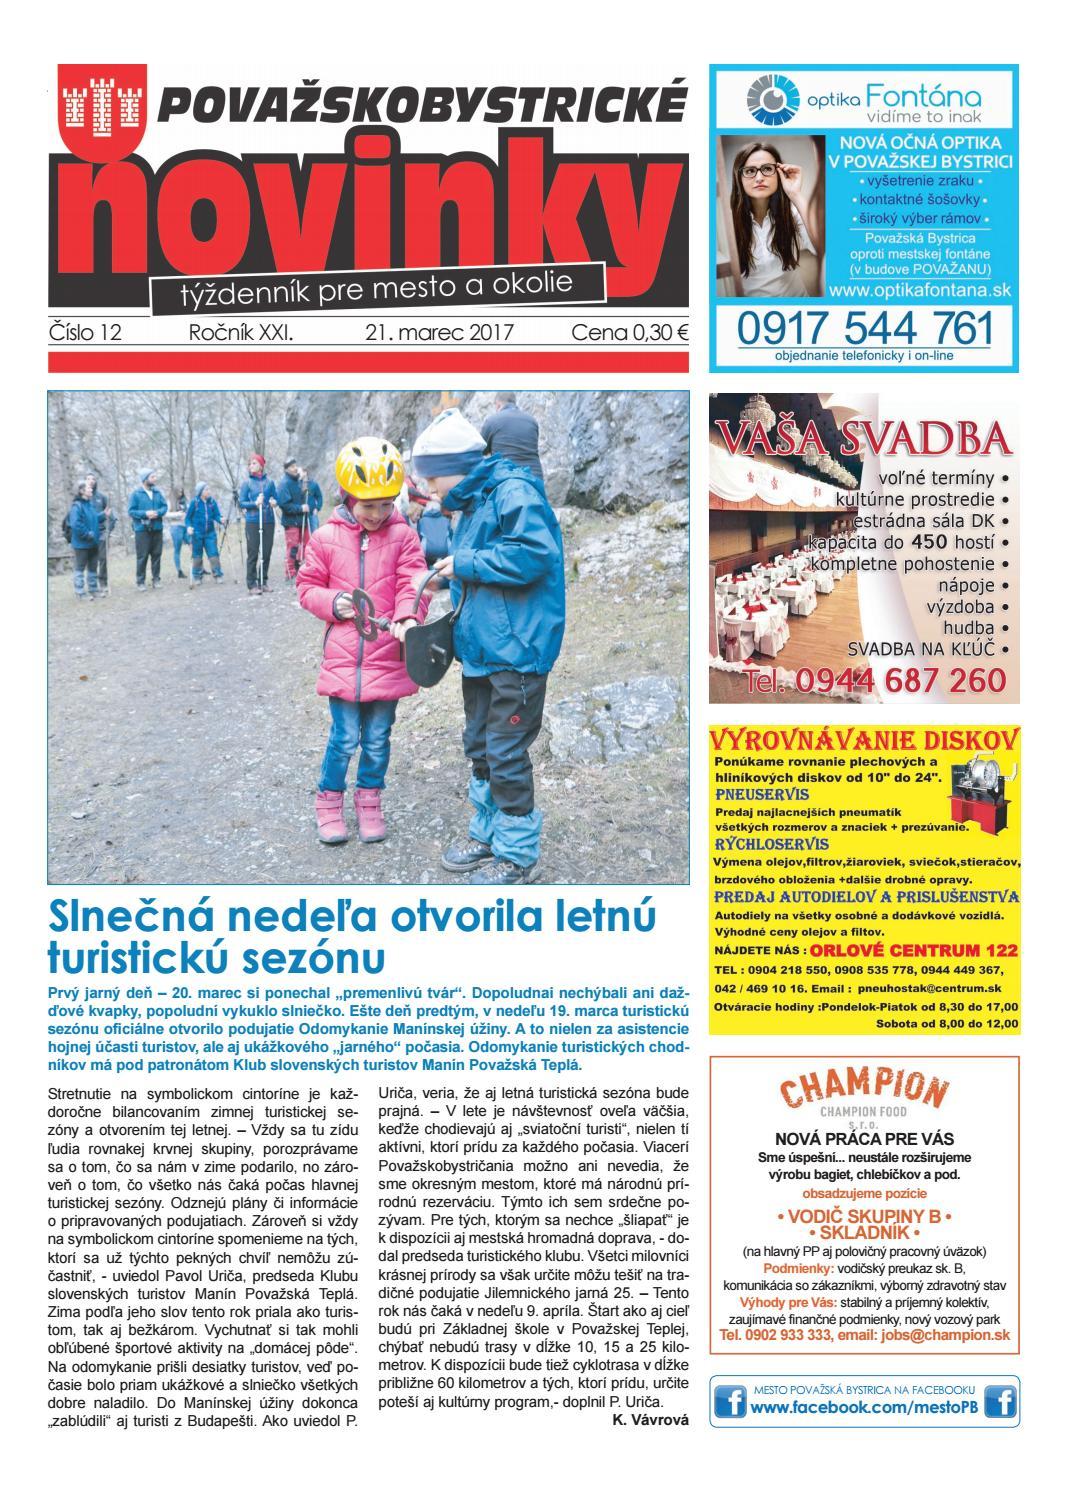 116423dc8242 Považskobystrické novinky č. 12 2017 by Považskobystrické novinky - issuu